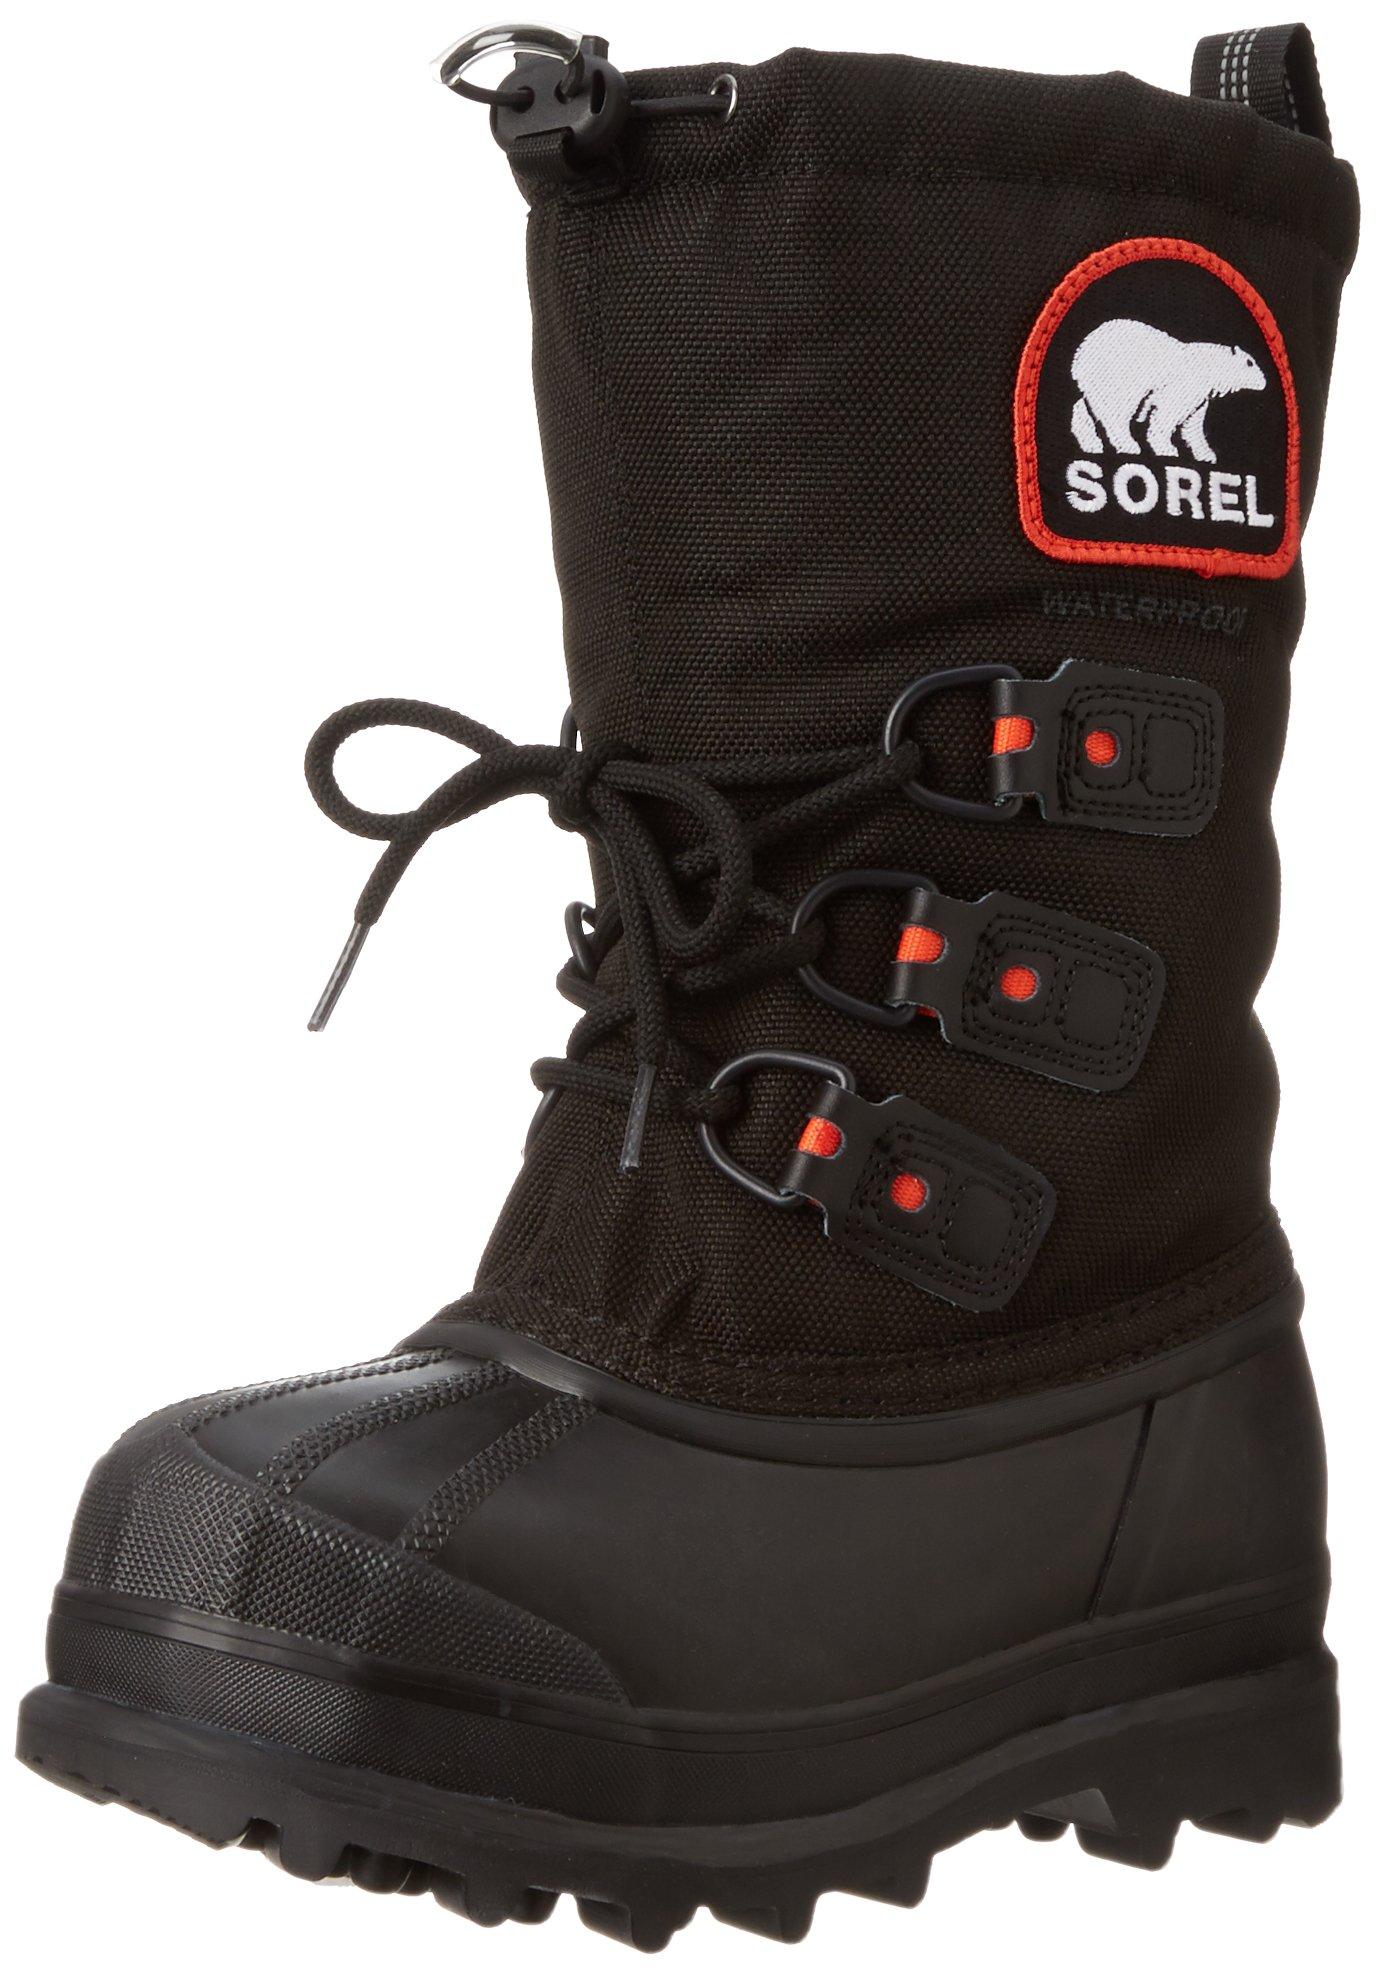 Sorel Youth Glacier XT Extreme Weather Boot (Little Kid/Big Kid),Black/Red Quartz,7 M US Big Kid by SOREL